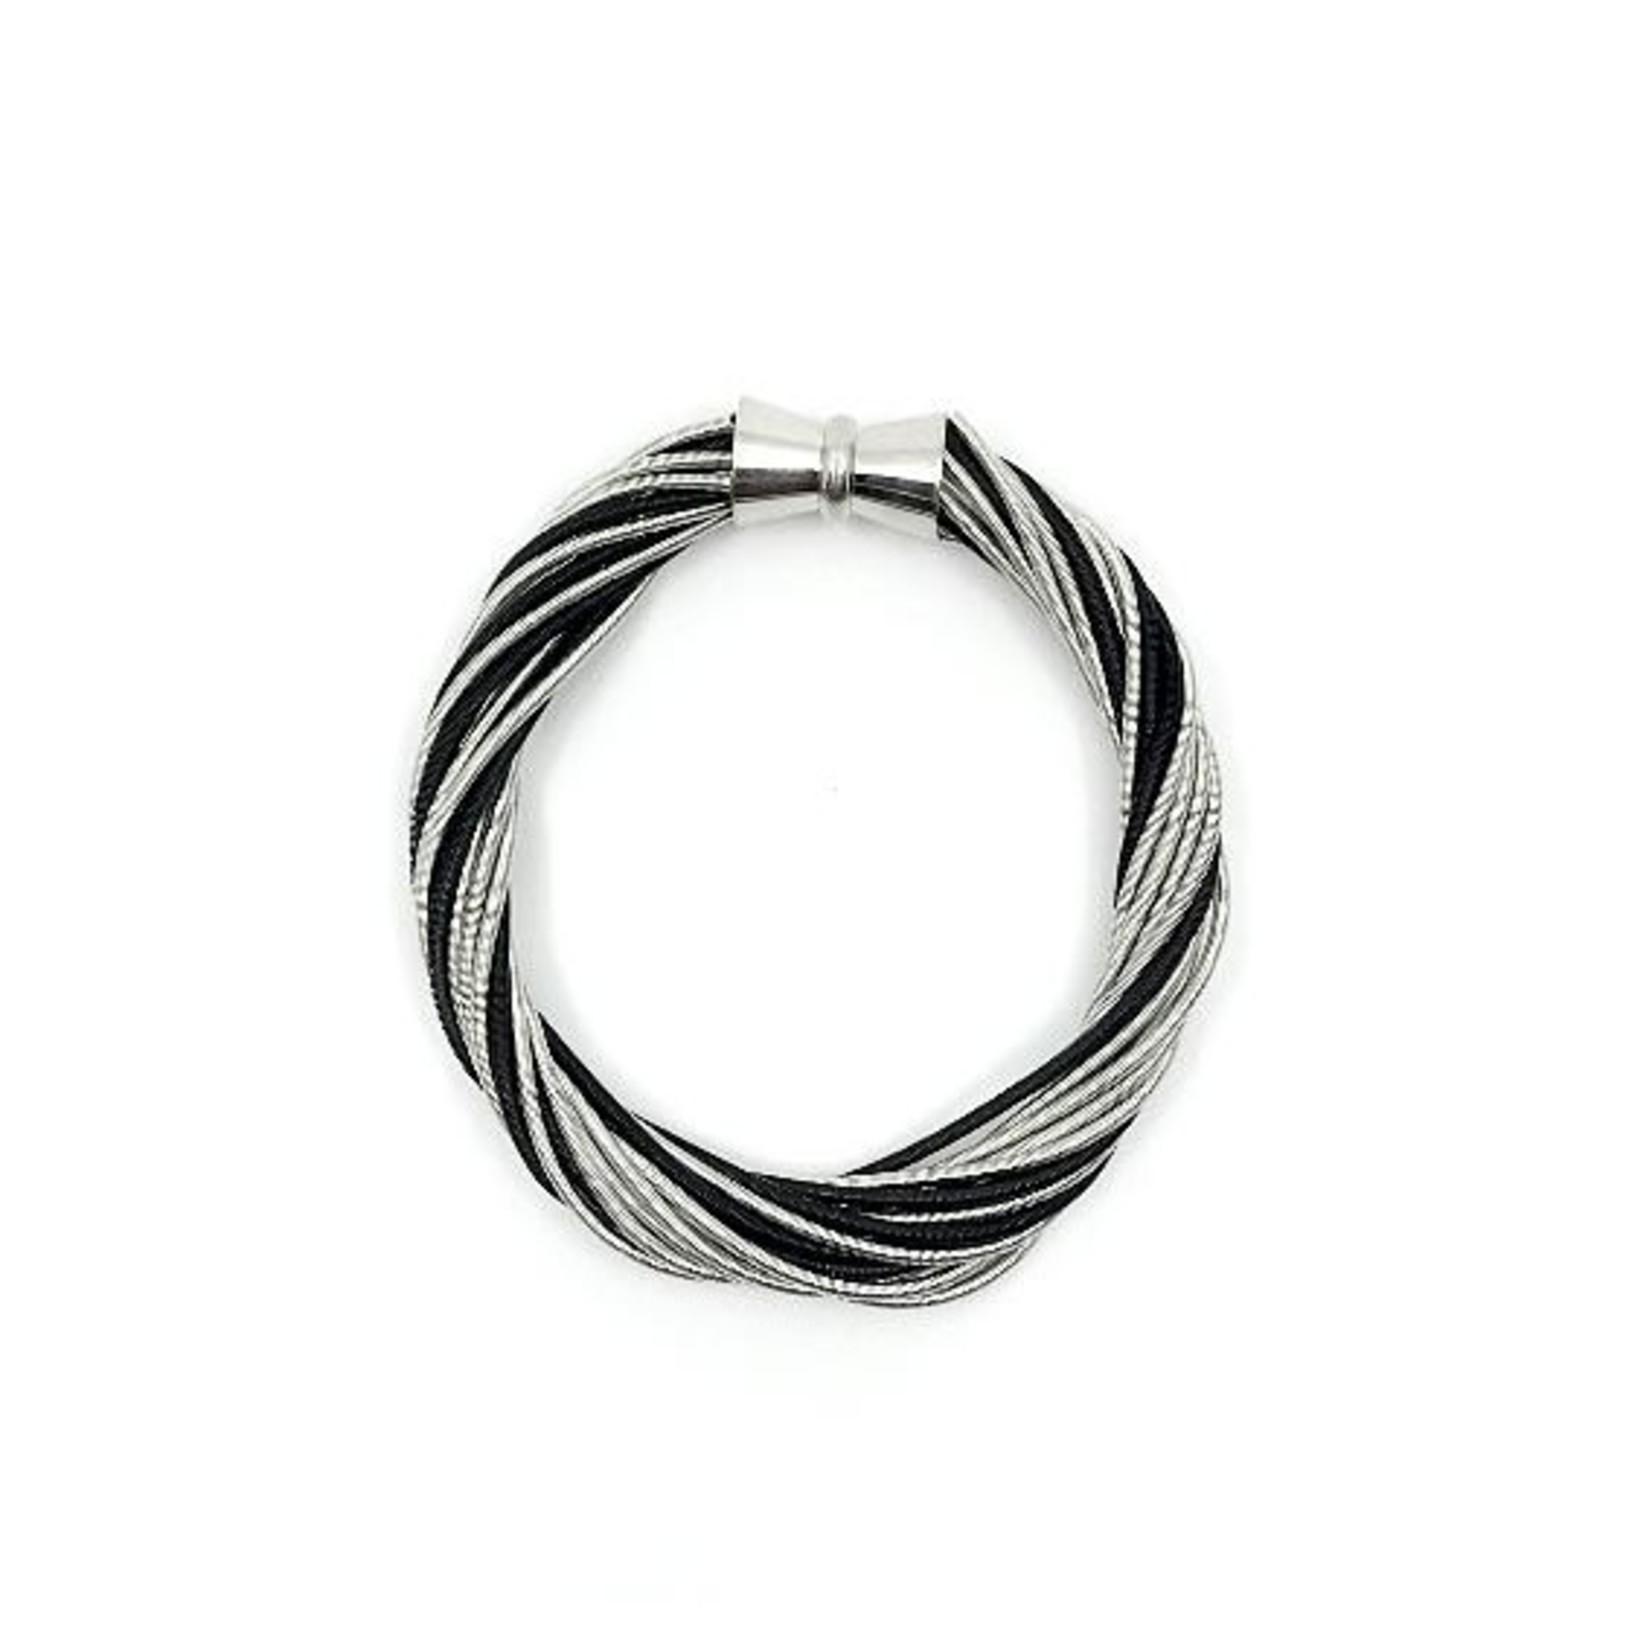 Sea Lily Silver/Black Piano Wire Twist Bracelet